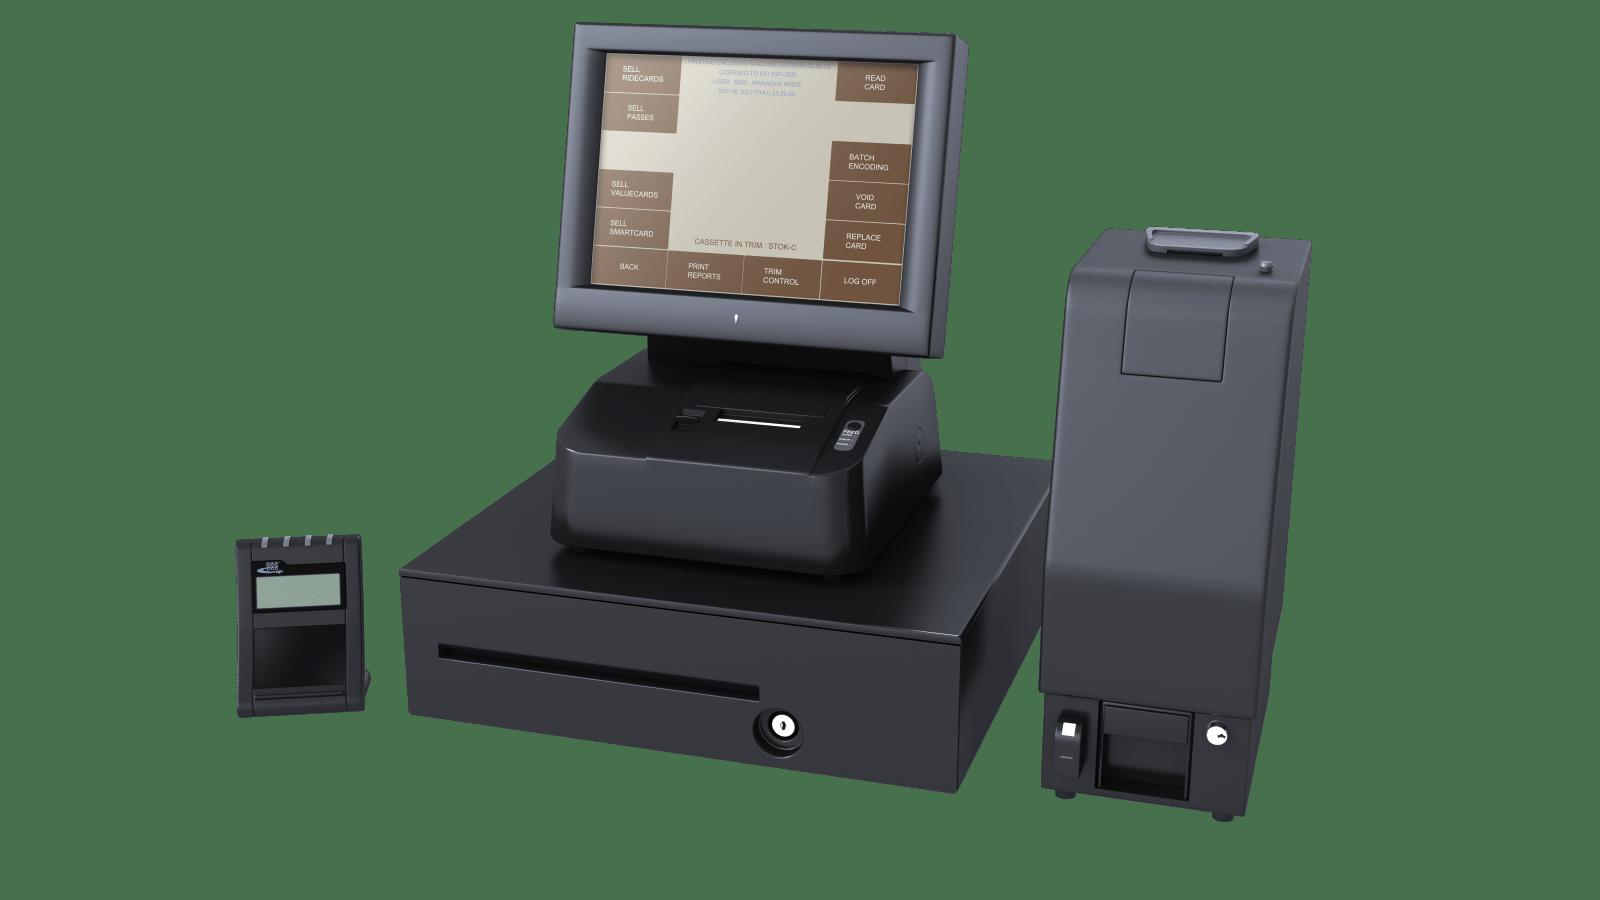 Genfare's PEM (Printer/Encoder Machine) farebox